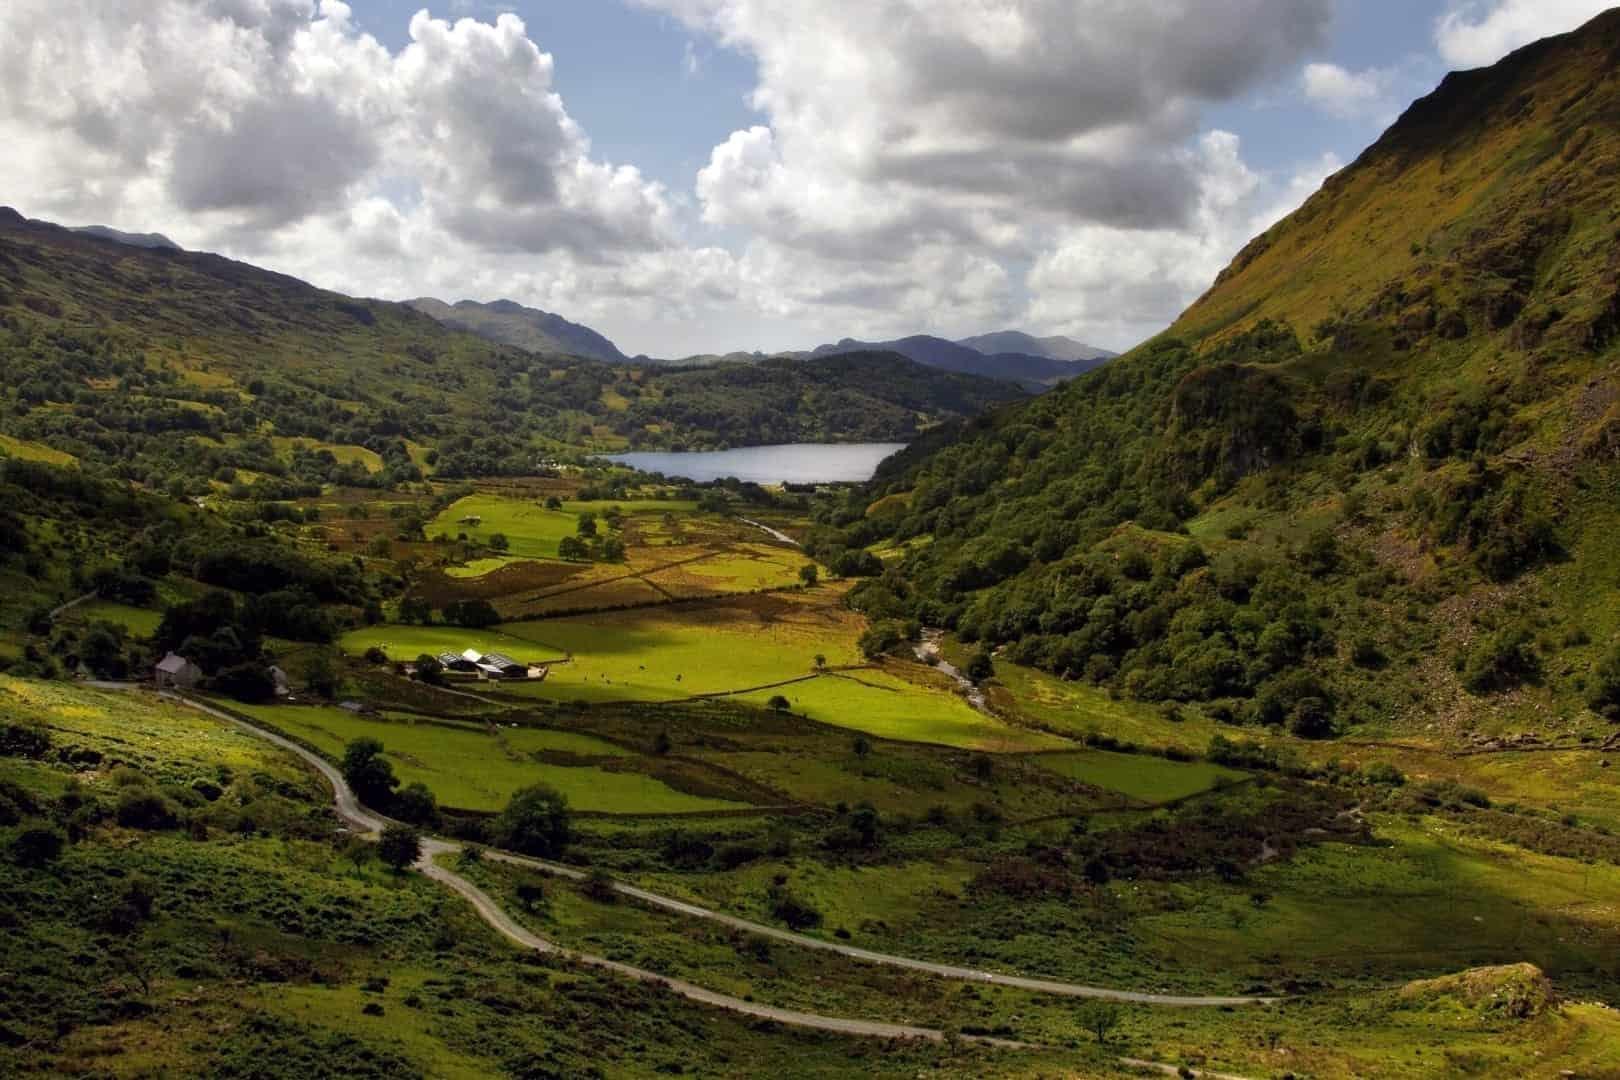 mountains of the Brecon Beacons near Powys